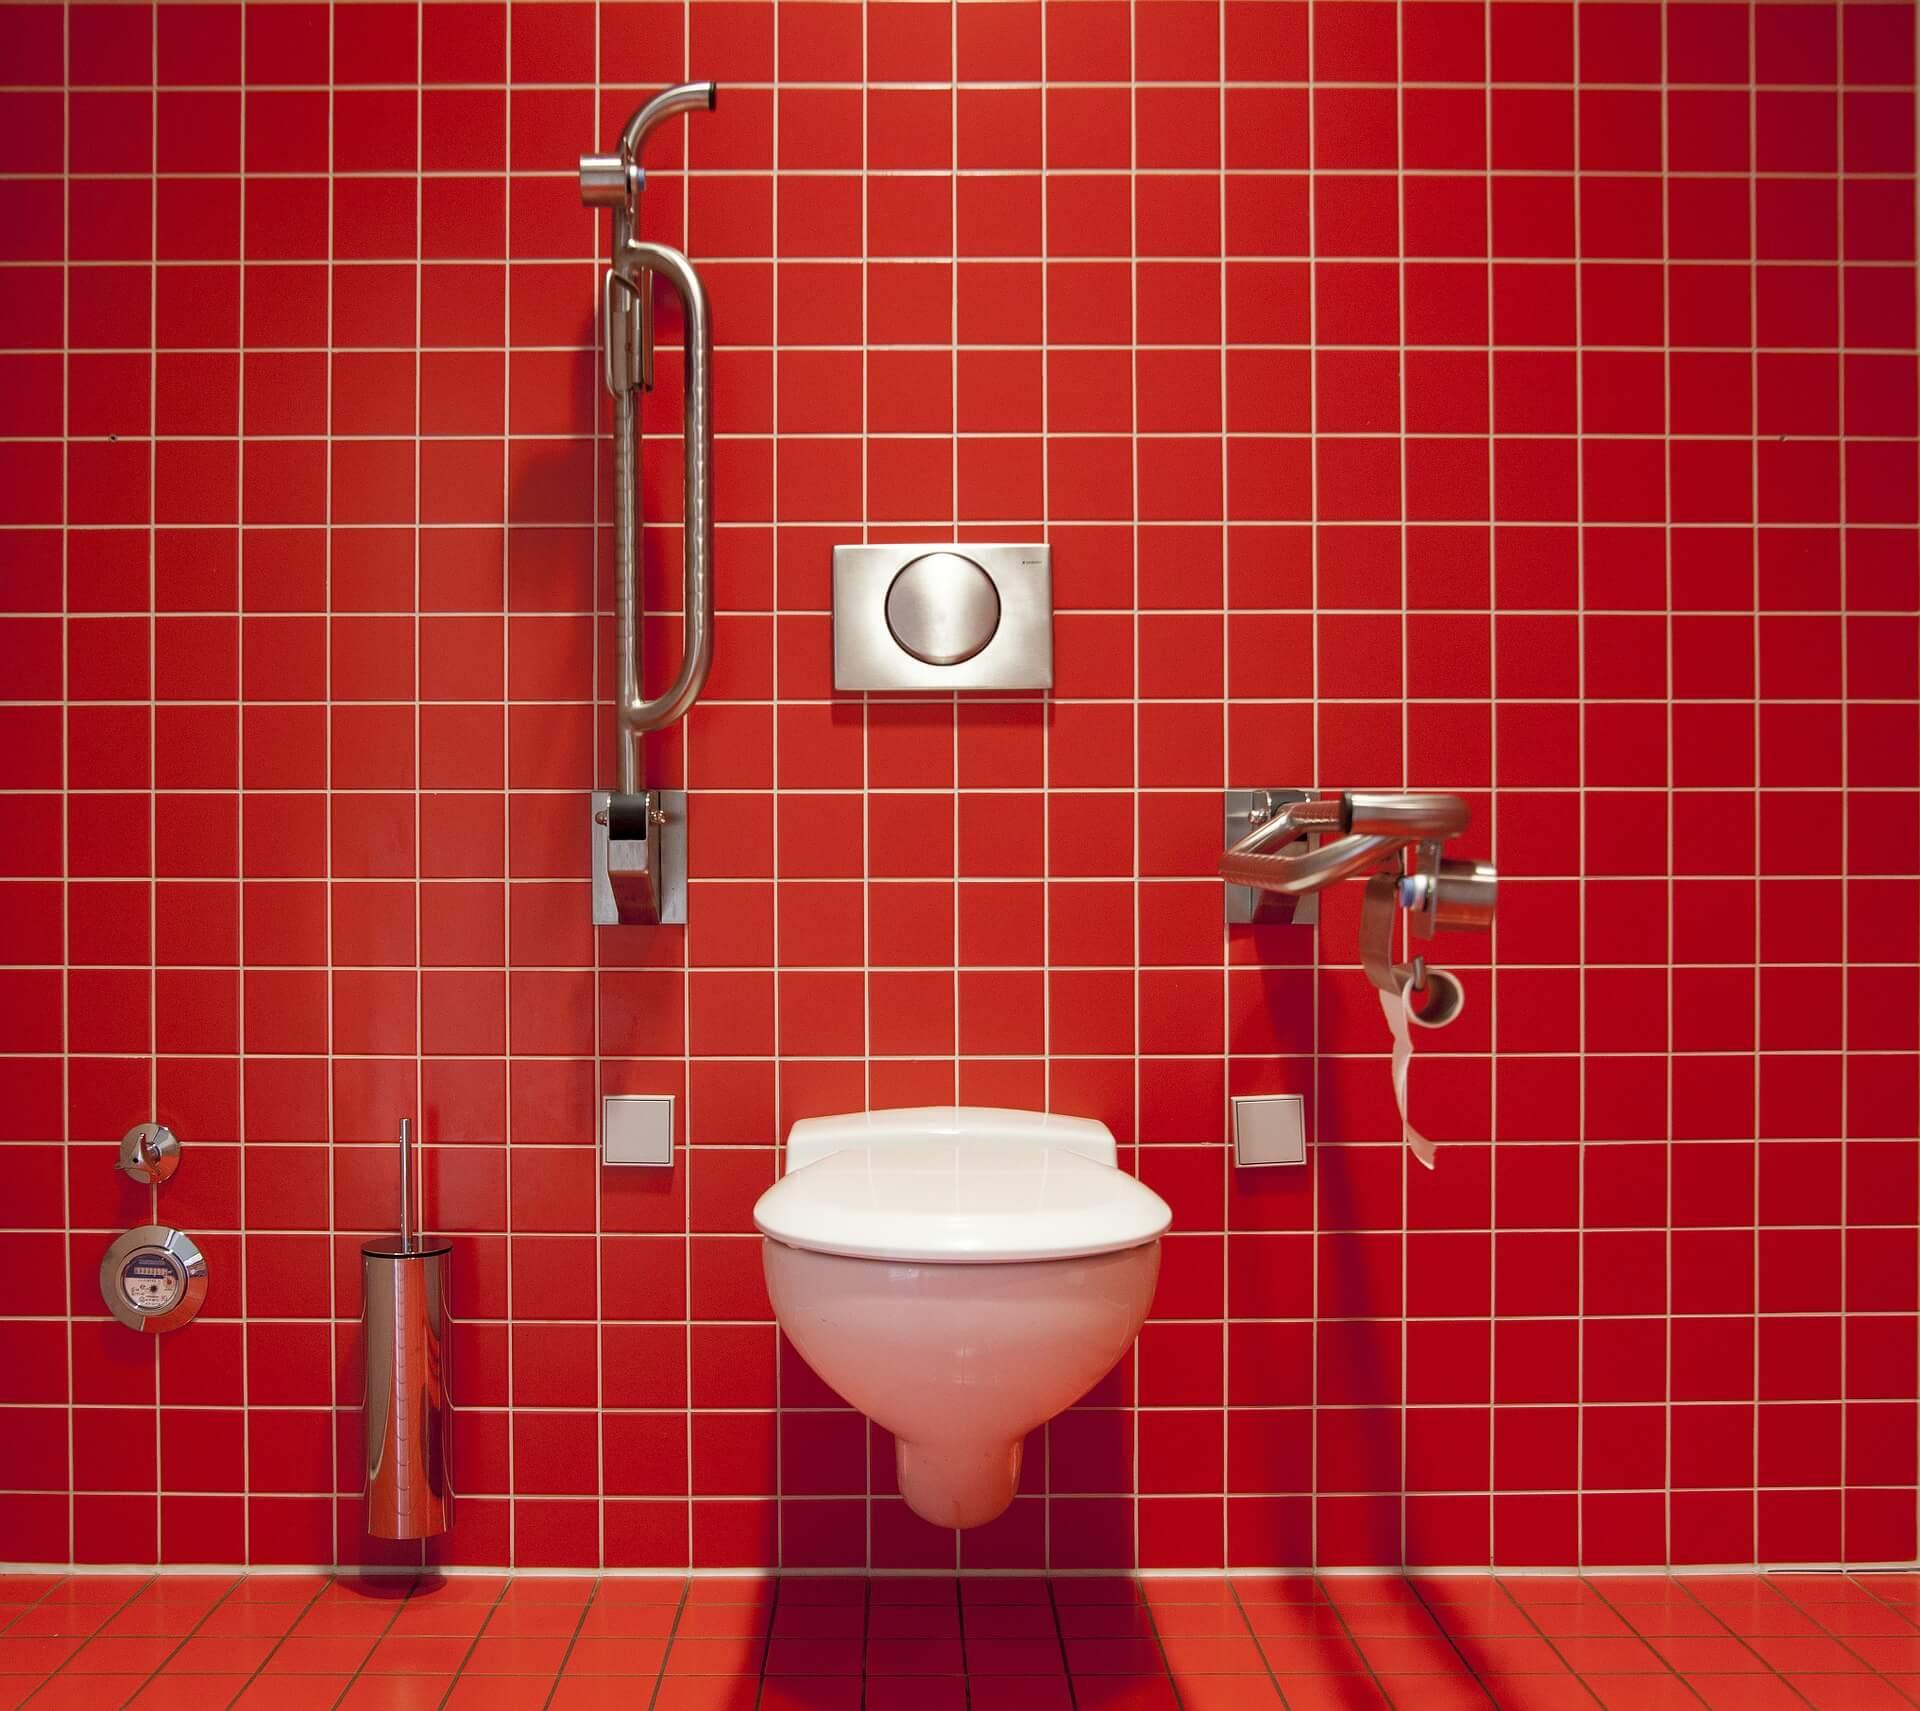 toilet, 3 ways to fix a clogged toilet at Mathews Plumbing